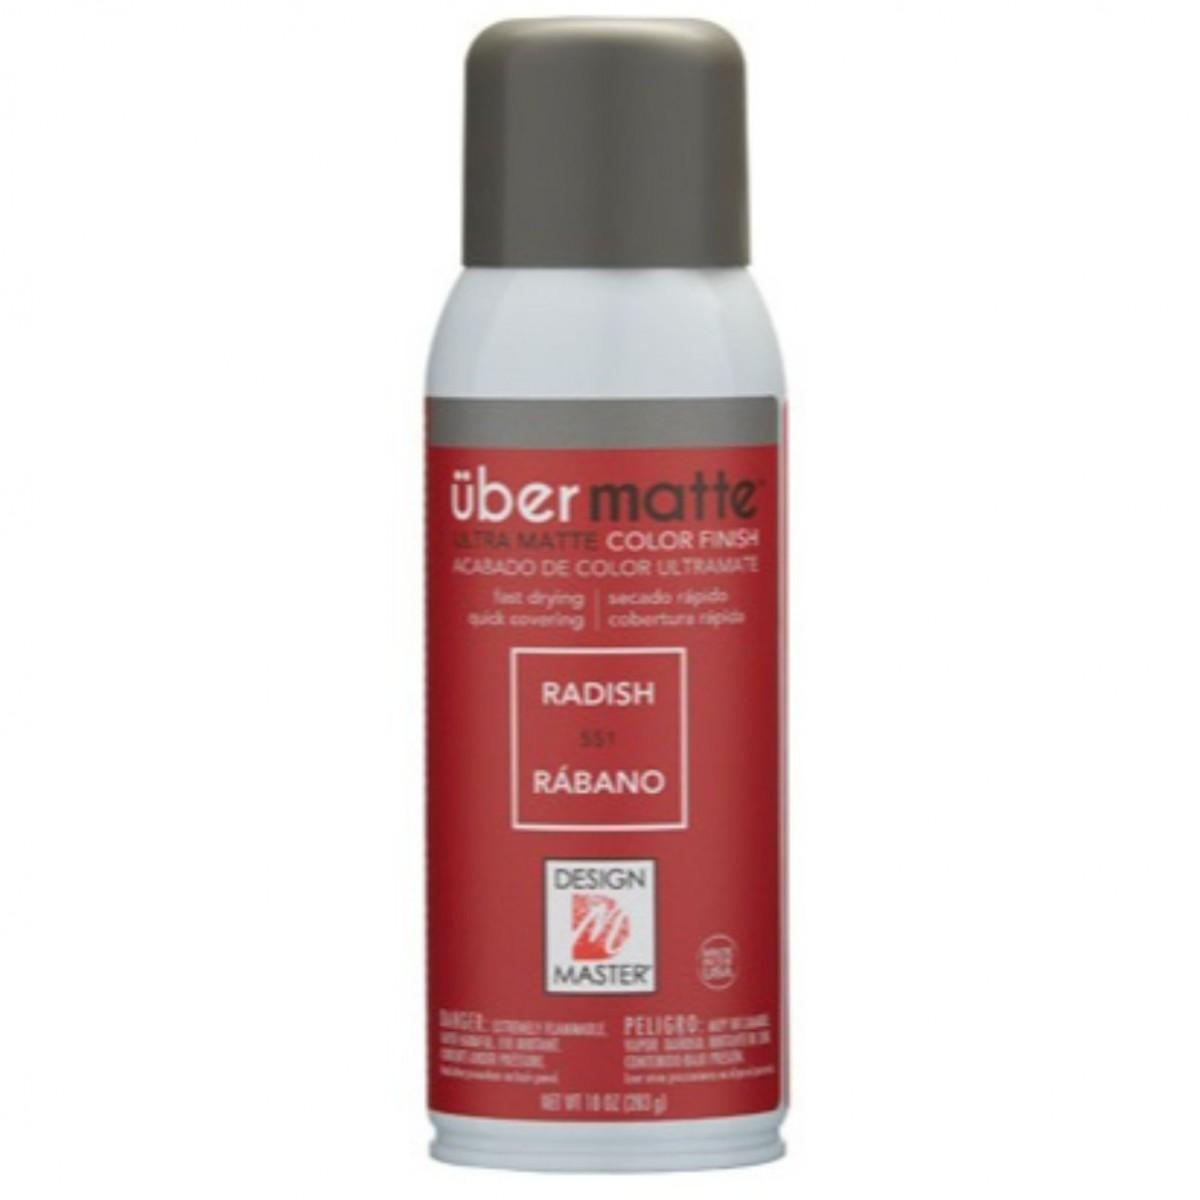 551 Radish DM Ubermatt Colour Spray Paint - 1 No